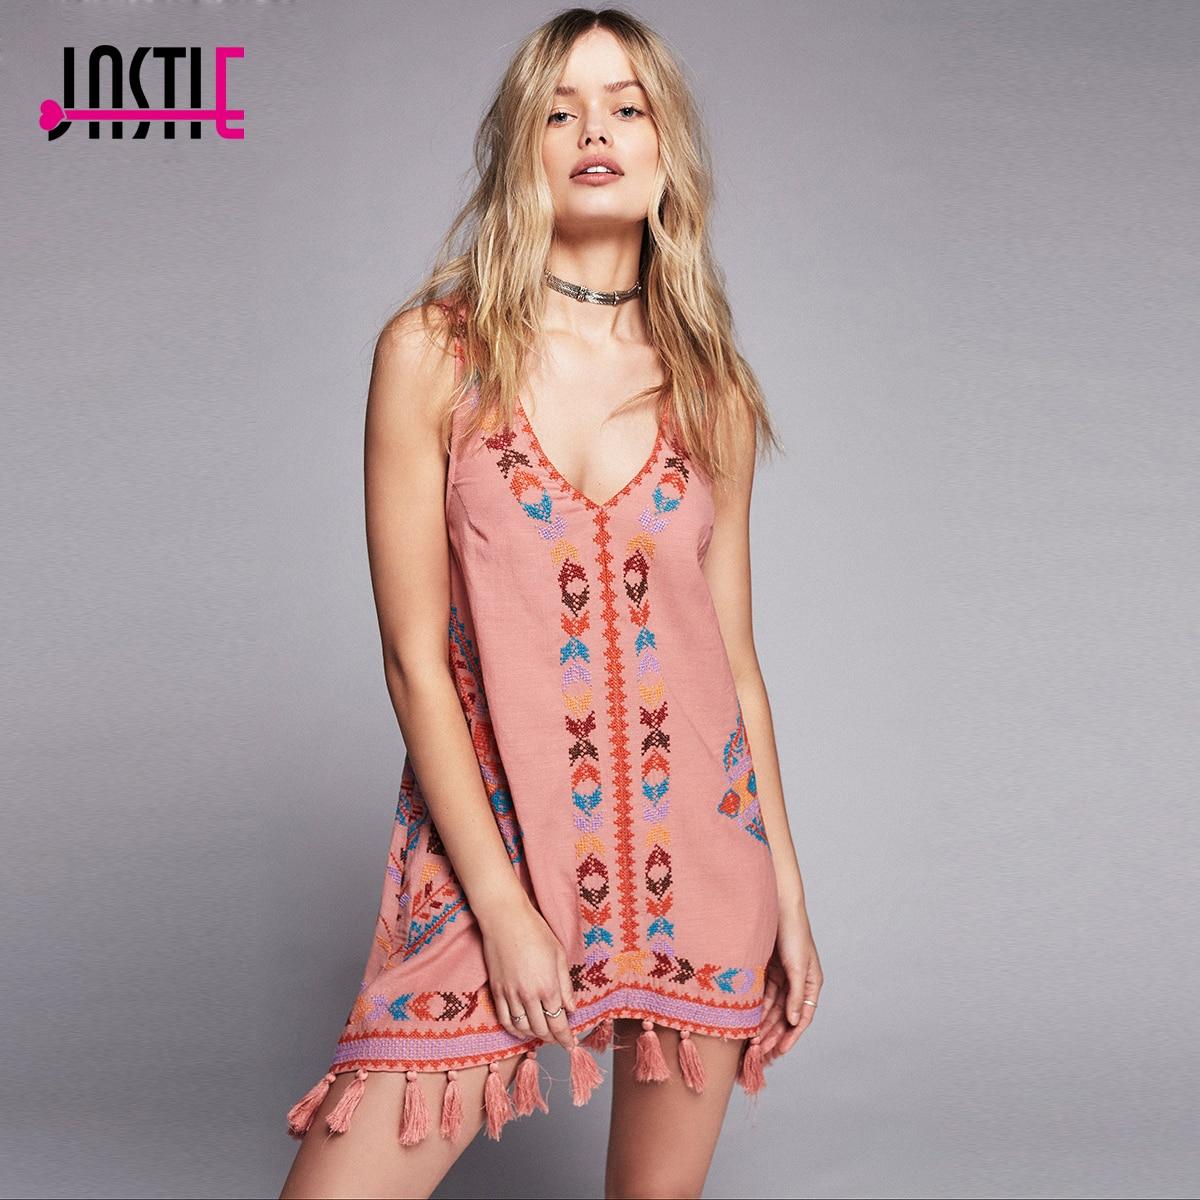 9f55630f4029 Detail Feedback Questions about Jastie Vintage Embroidered Gaia Slip Women  Mini Dress Tassels Hem Boho Dress Shapeless Silhouette V Neck Summer Dress  ...